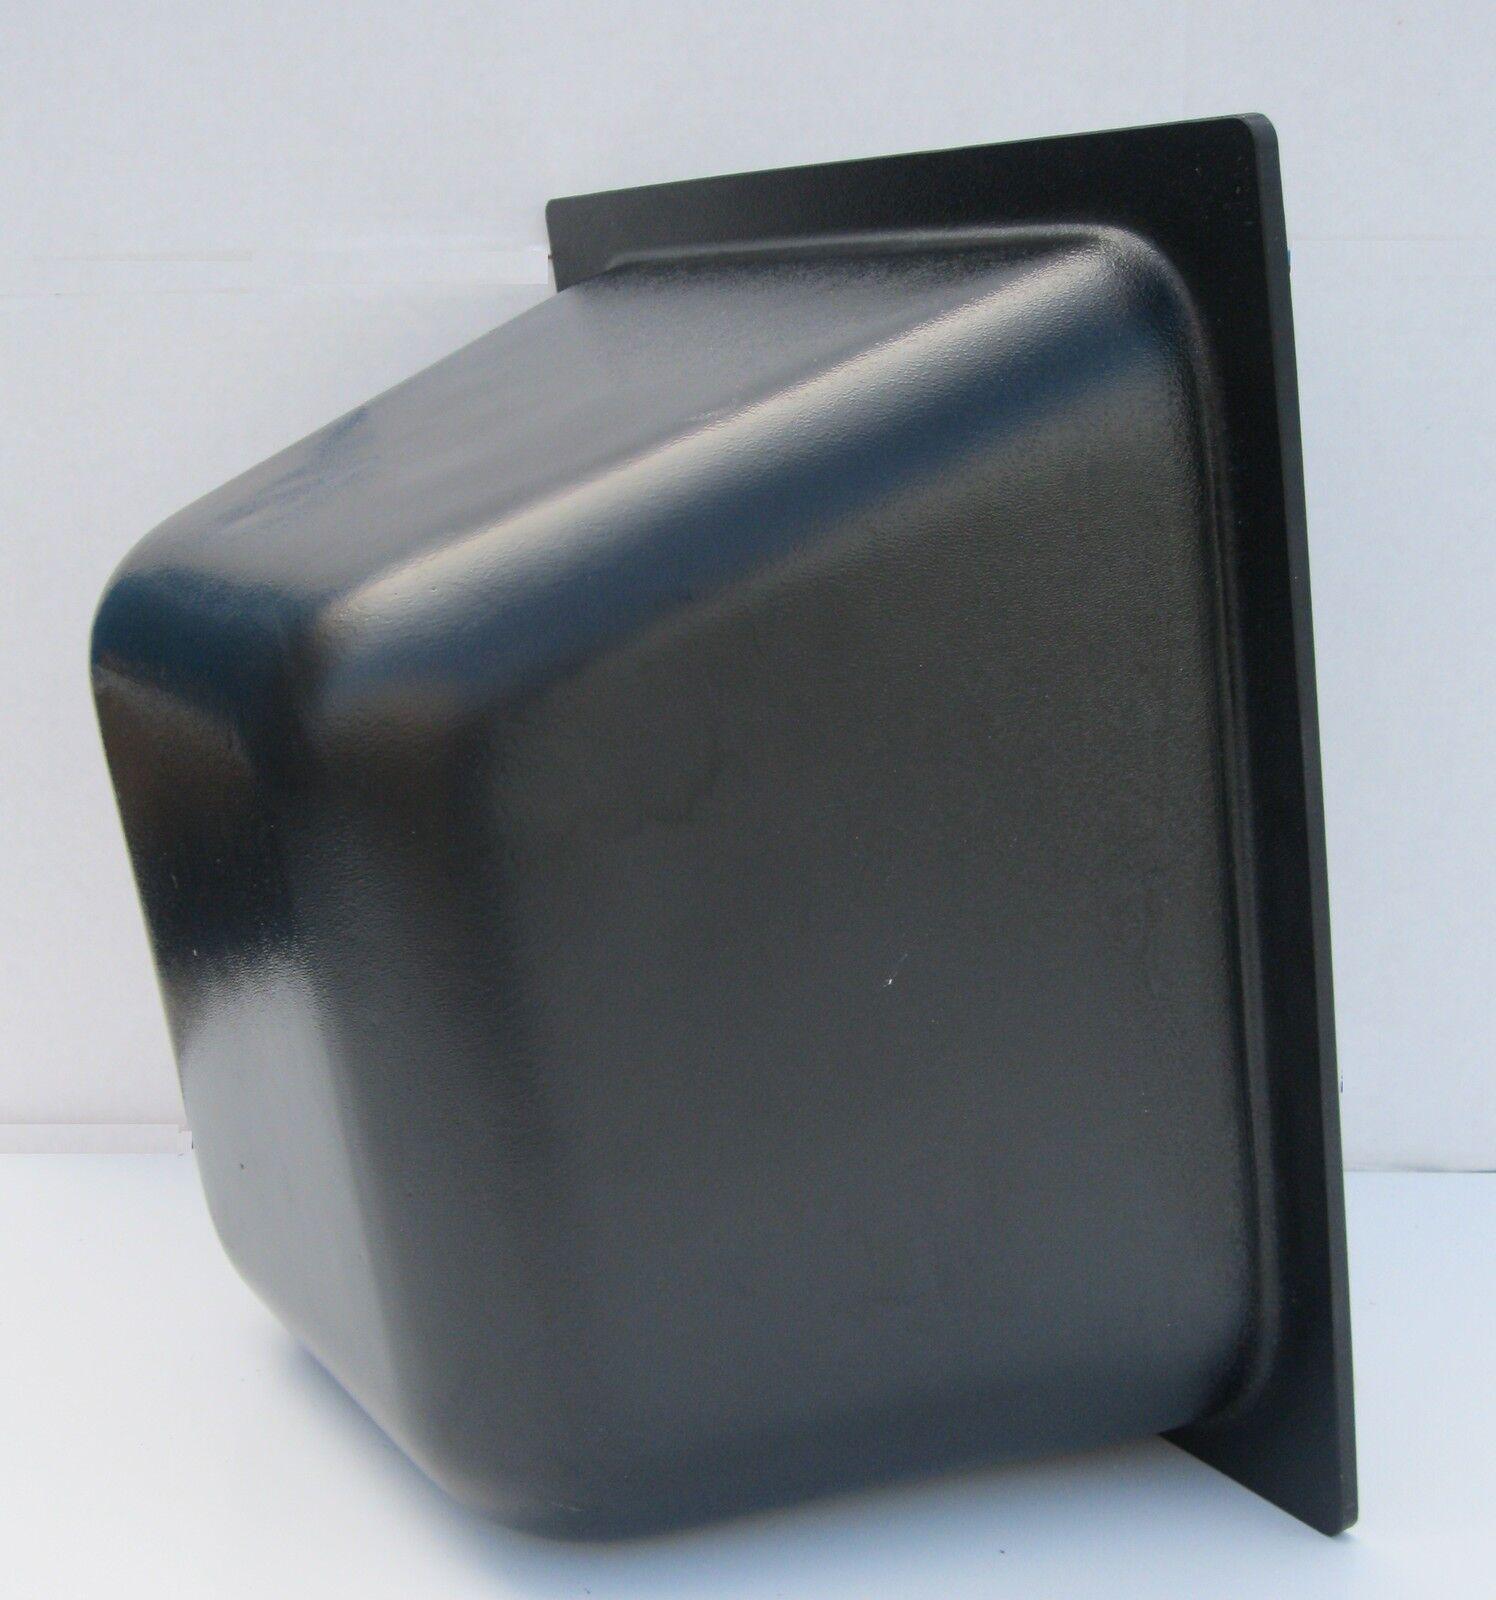 Powermatic table saw motor cover dust door replacements for Powermatic 66 table saw motor